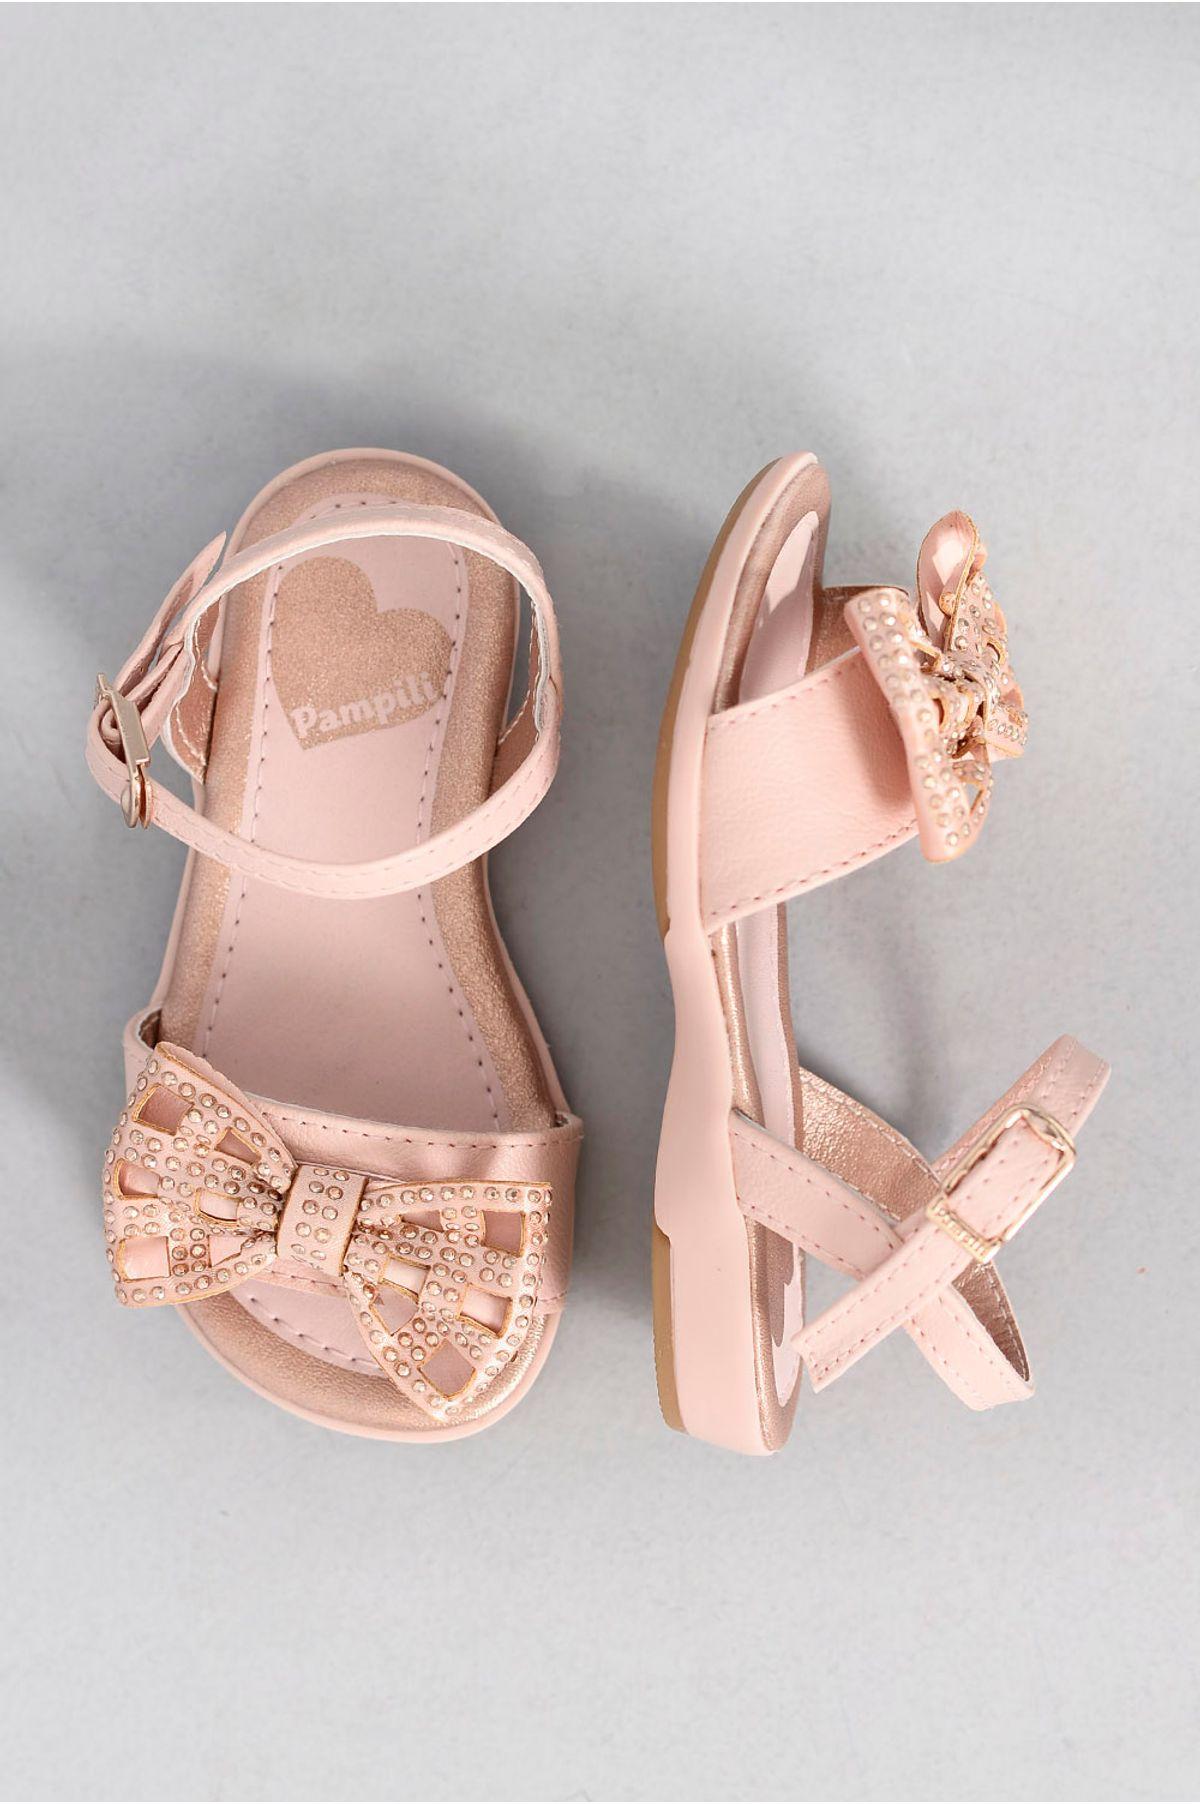 f51bce247 Sandália Infantil Juju Baby Pampili ROSA - Mundial Calçados